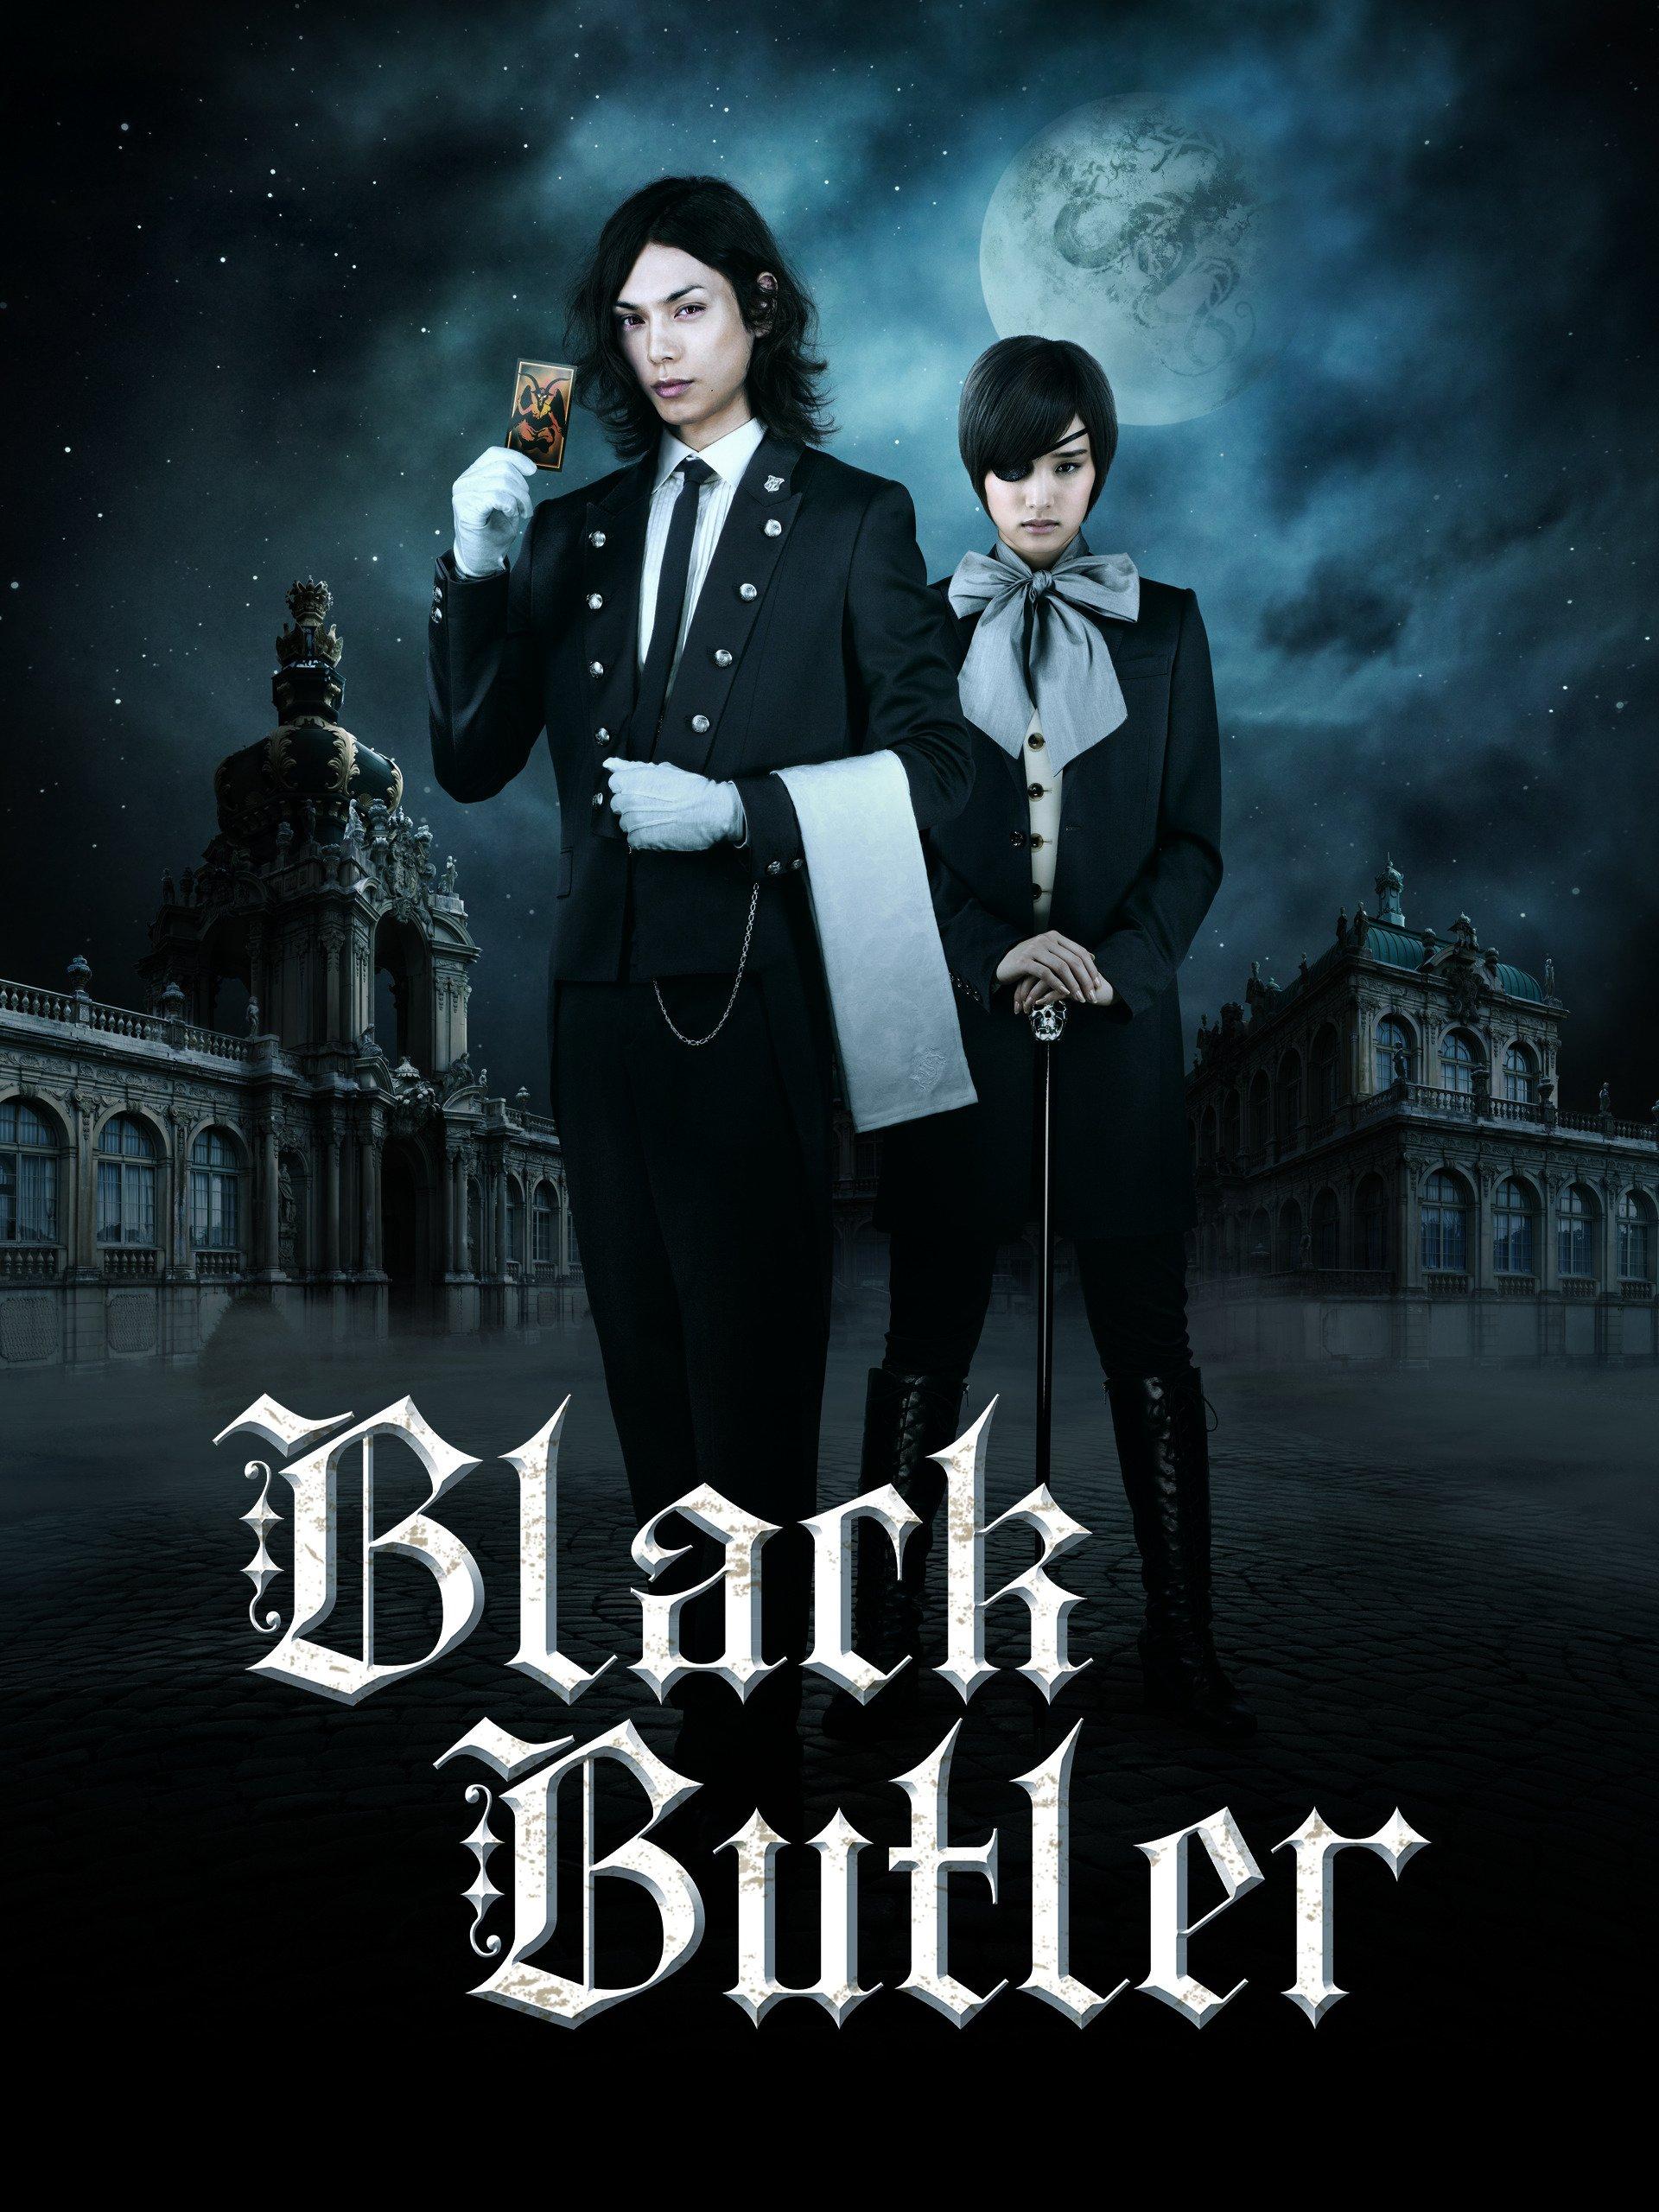 Black Butler film review